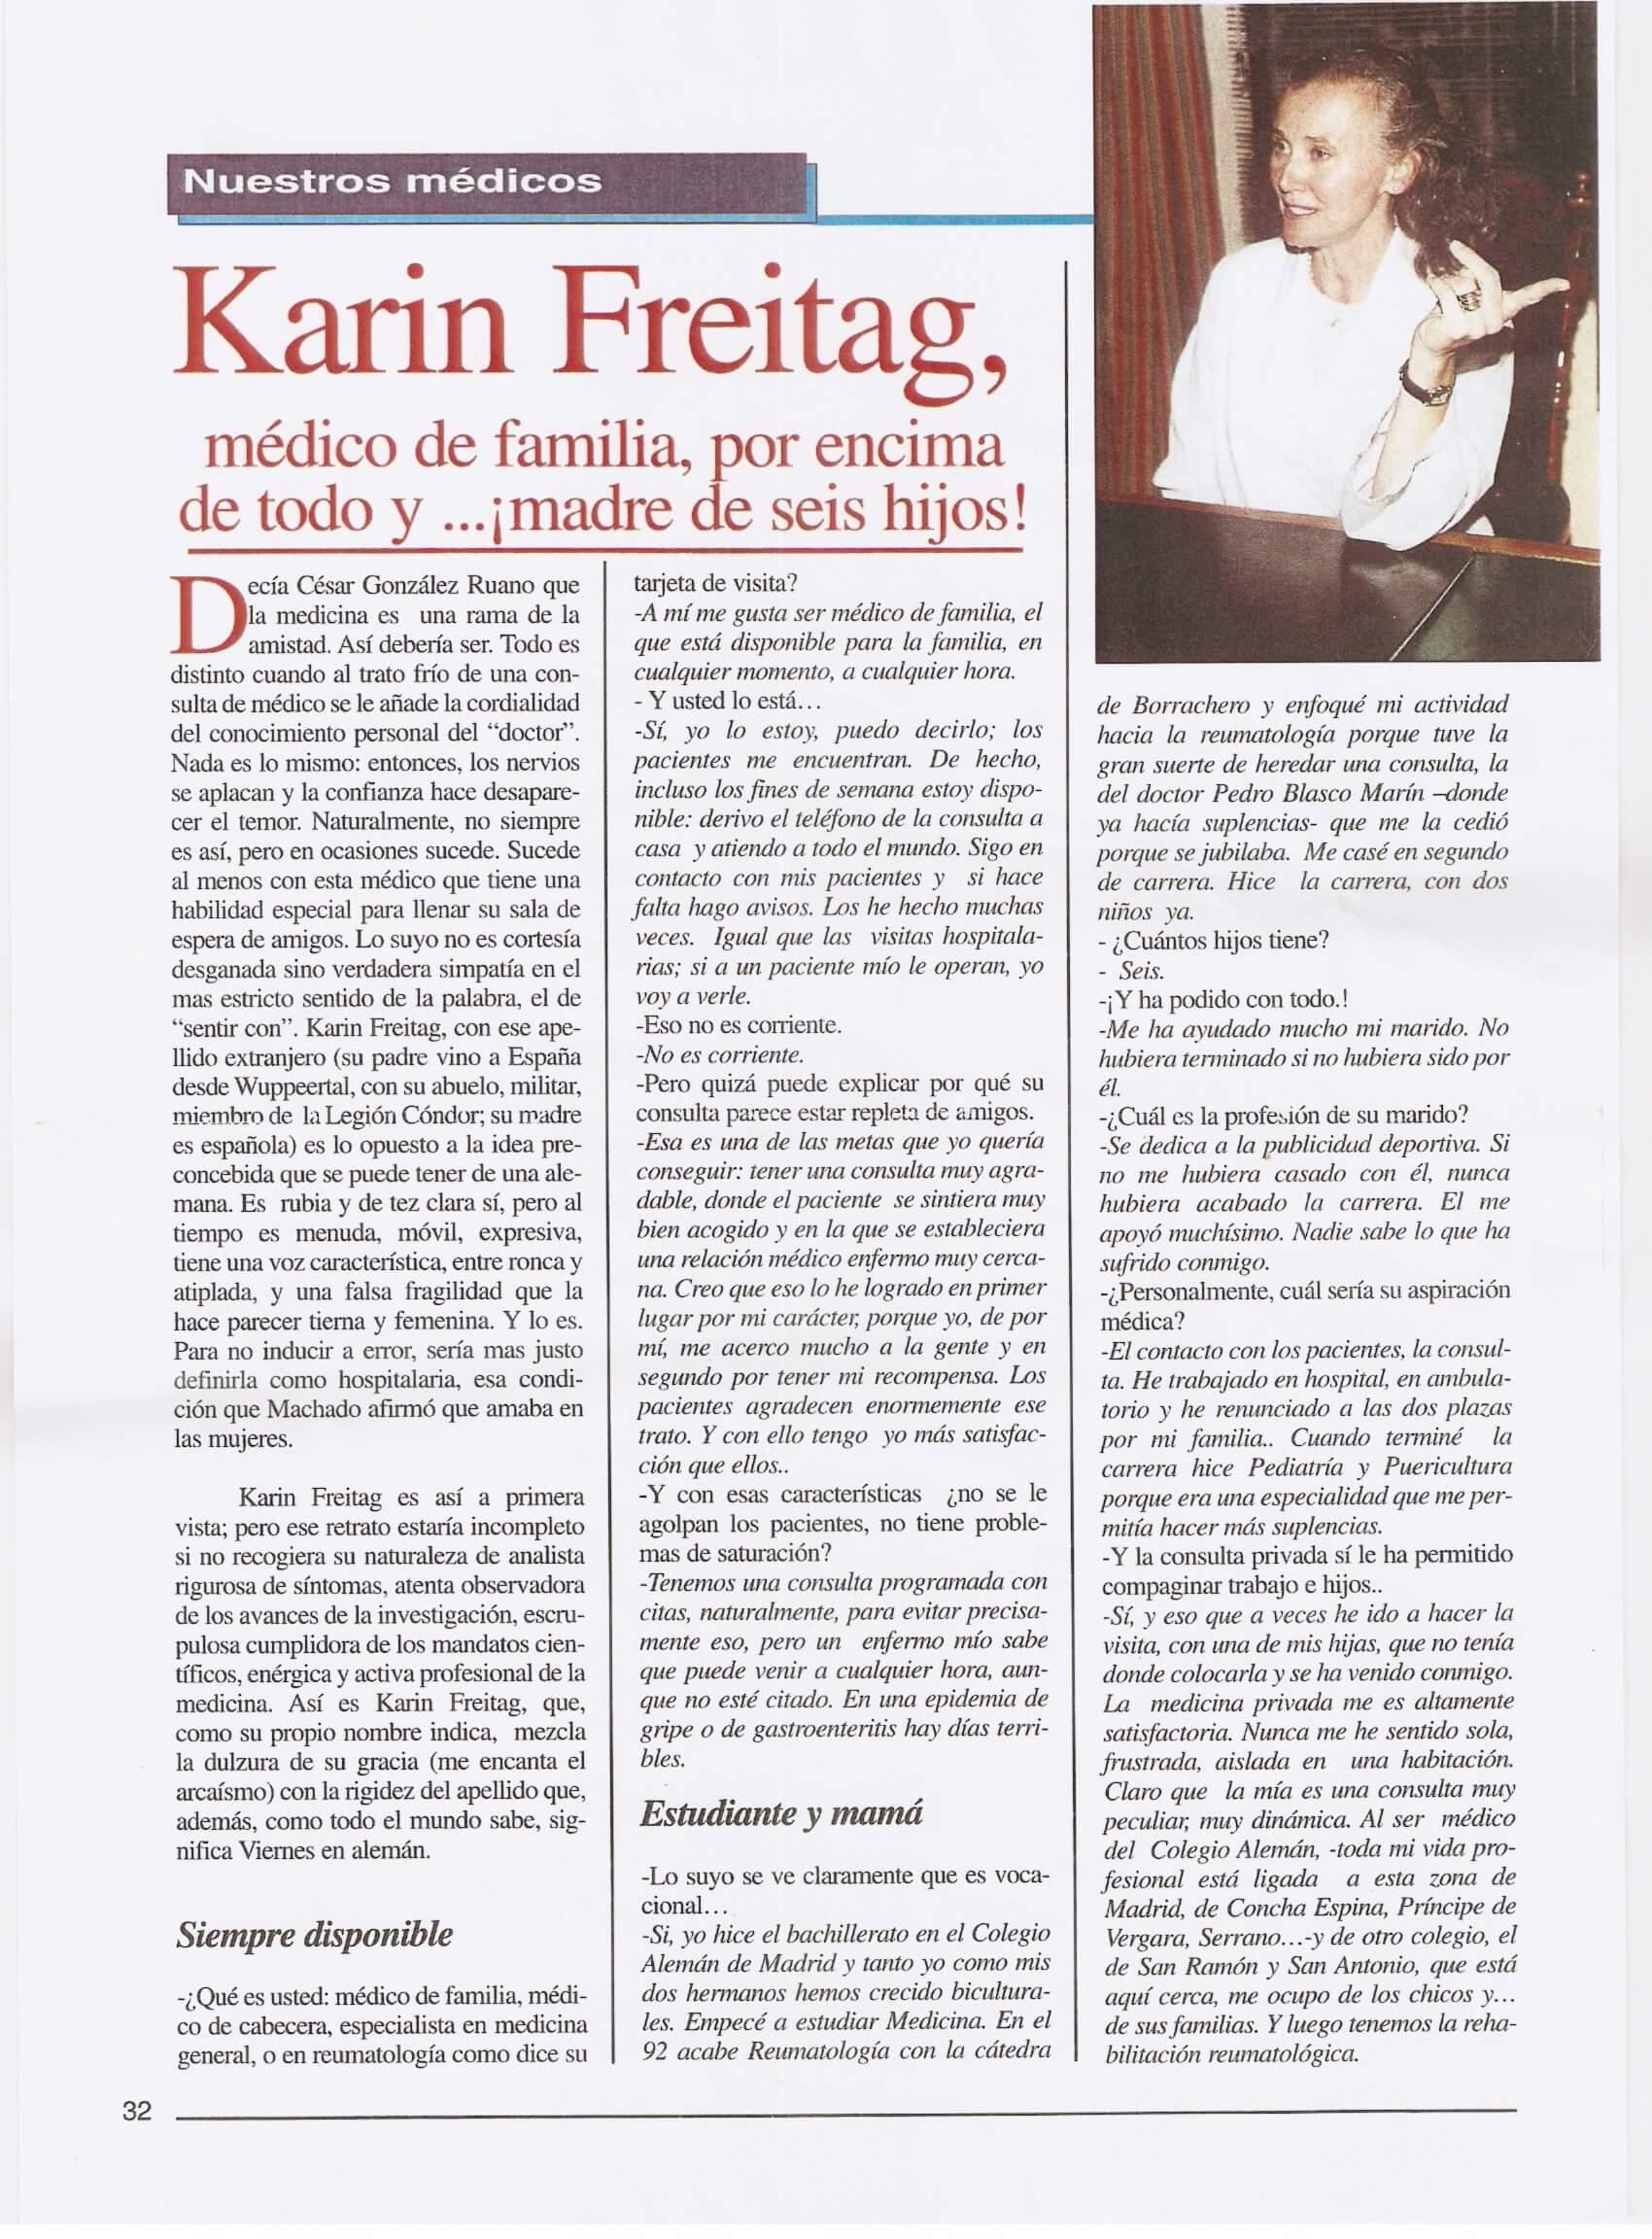 Conocer a la Dra. Karin Freitag